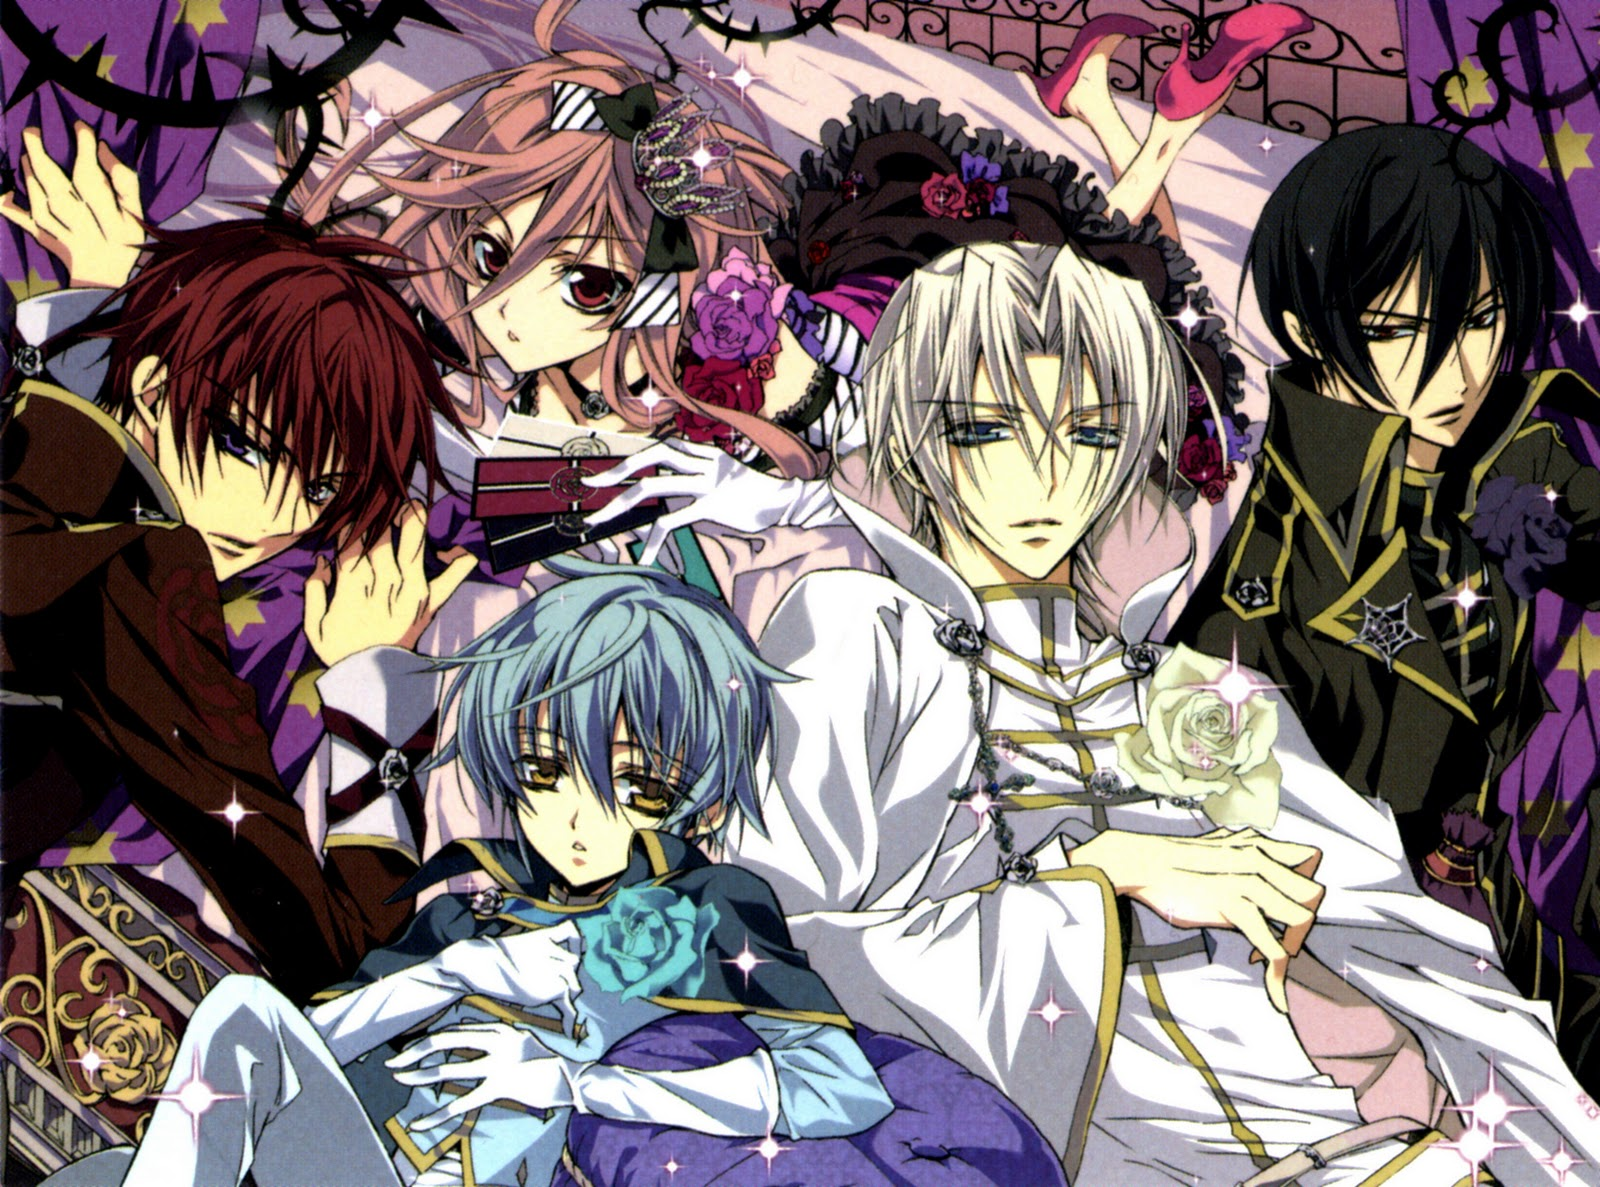 Animefreak barajou no kiss manga - Manga princesse ...